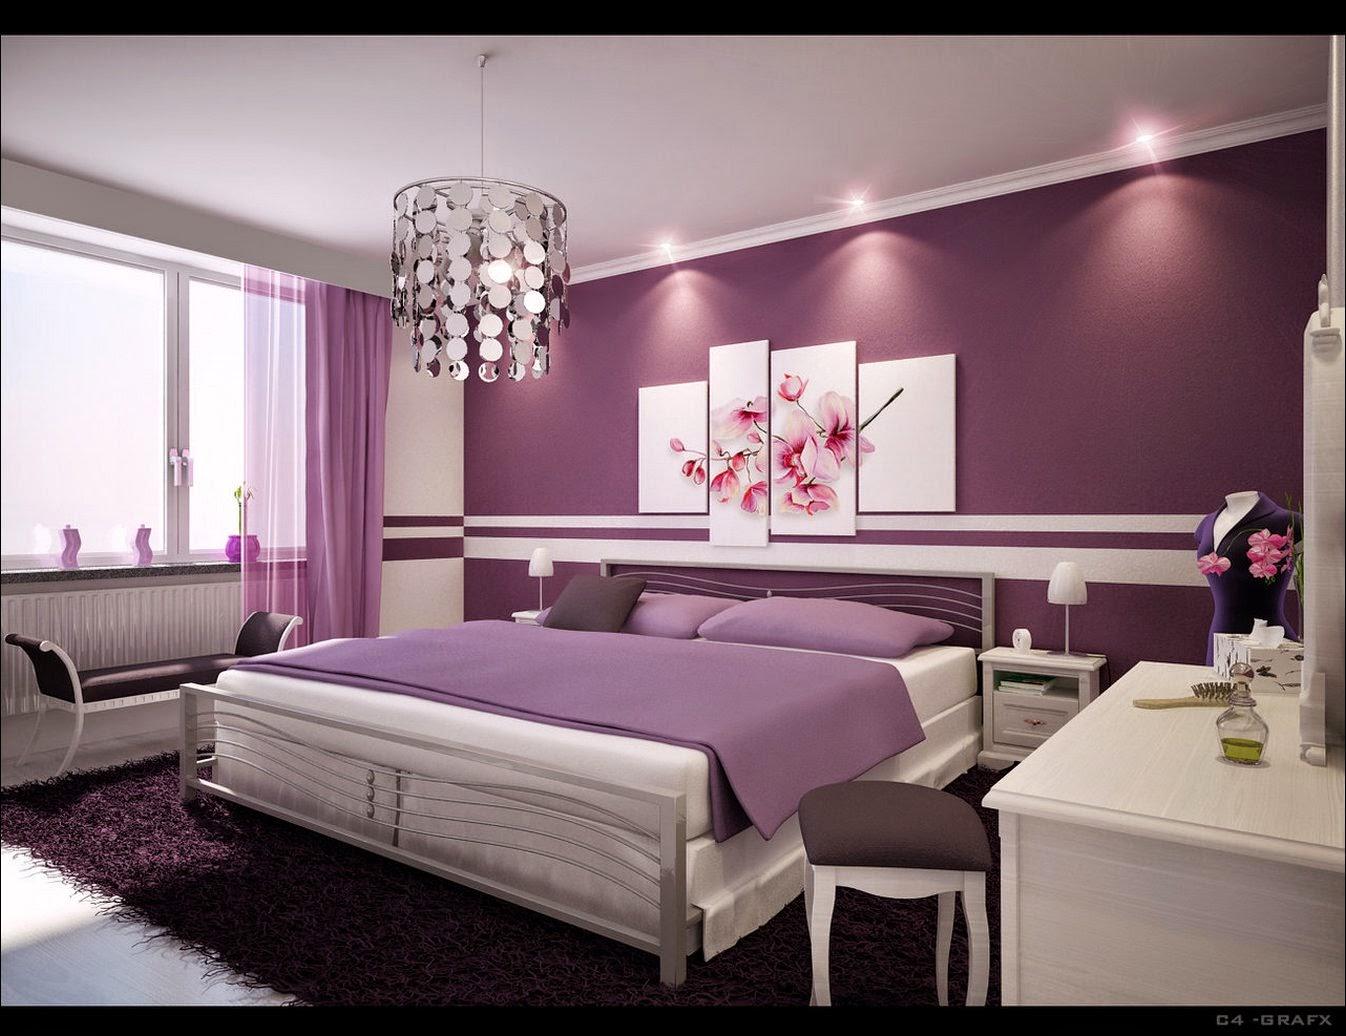 Beautiful bedroom design free download wallpaper - Wallpaper design for bedroom ...